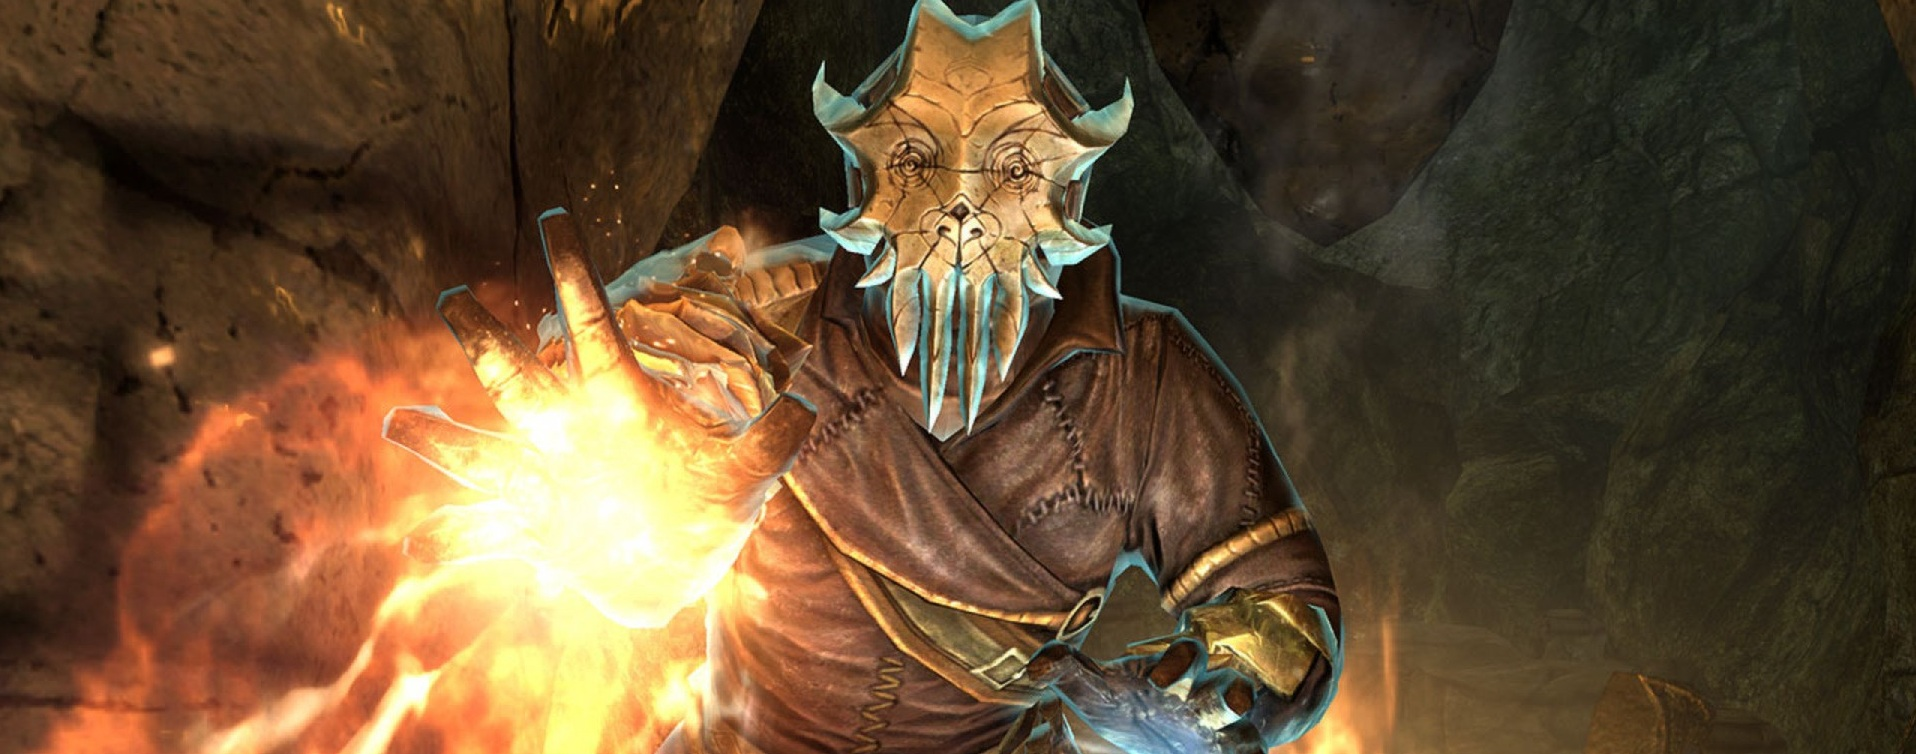 Skyrim HD Texture Pack update includes Dragonborn